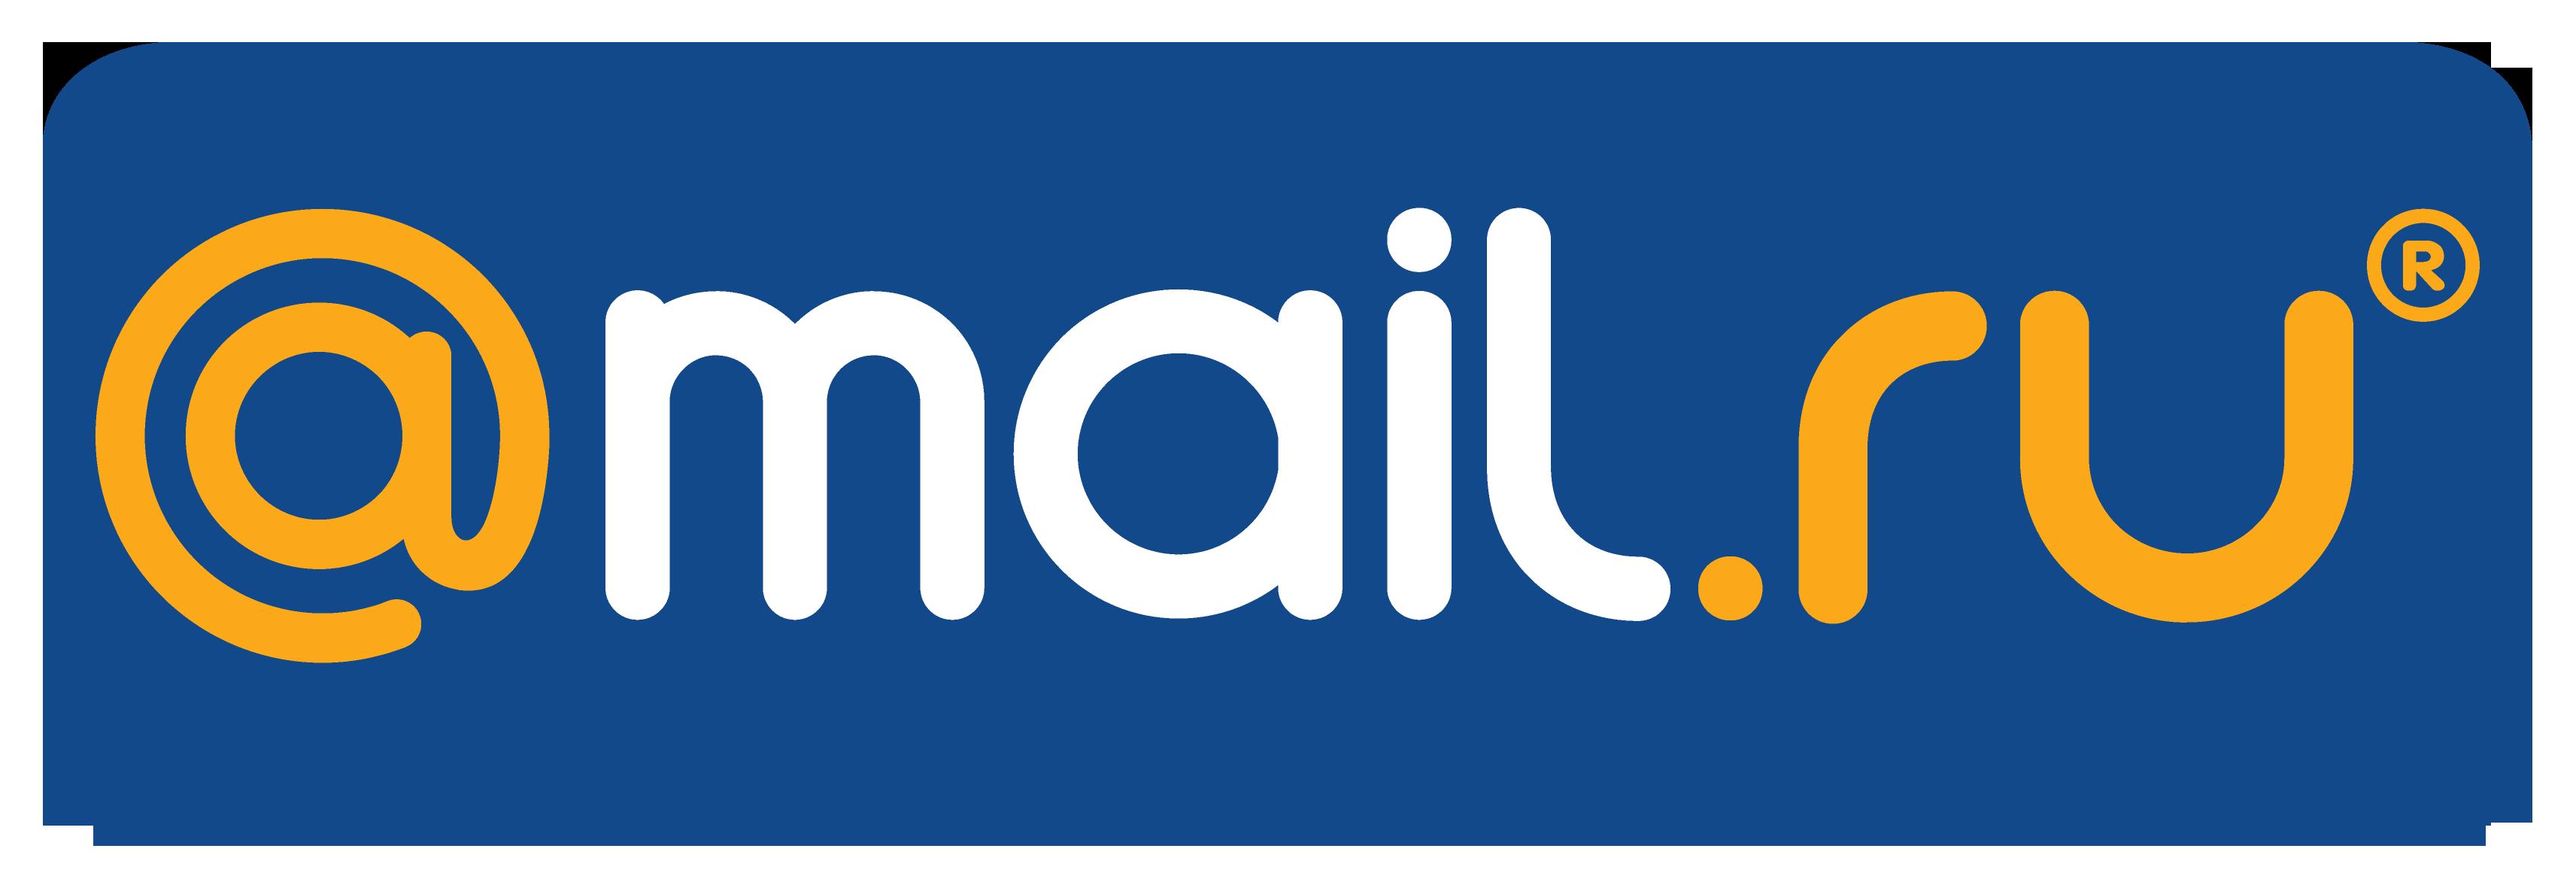 логотип маил ру